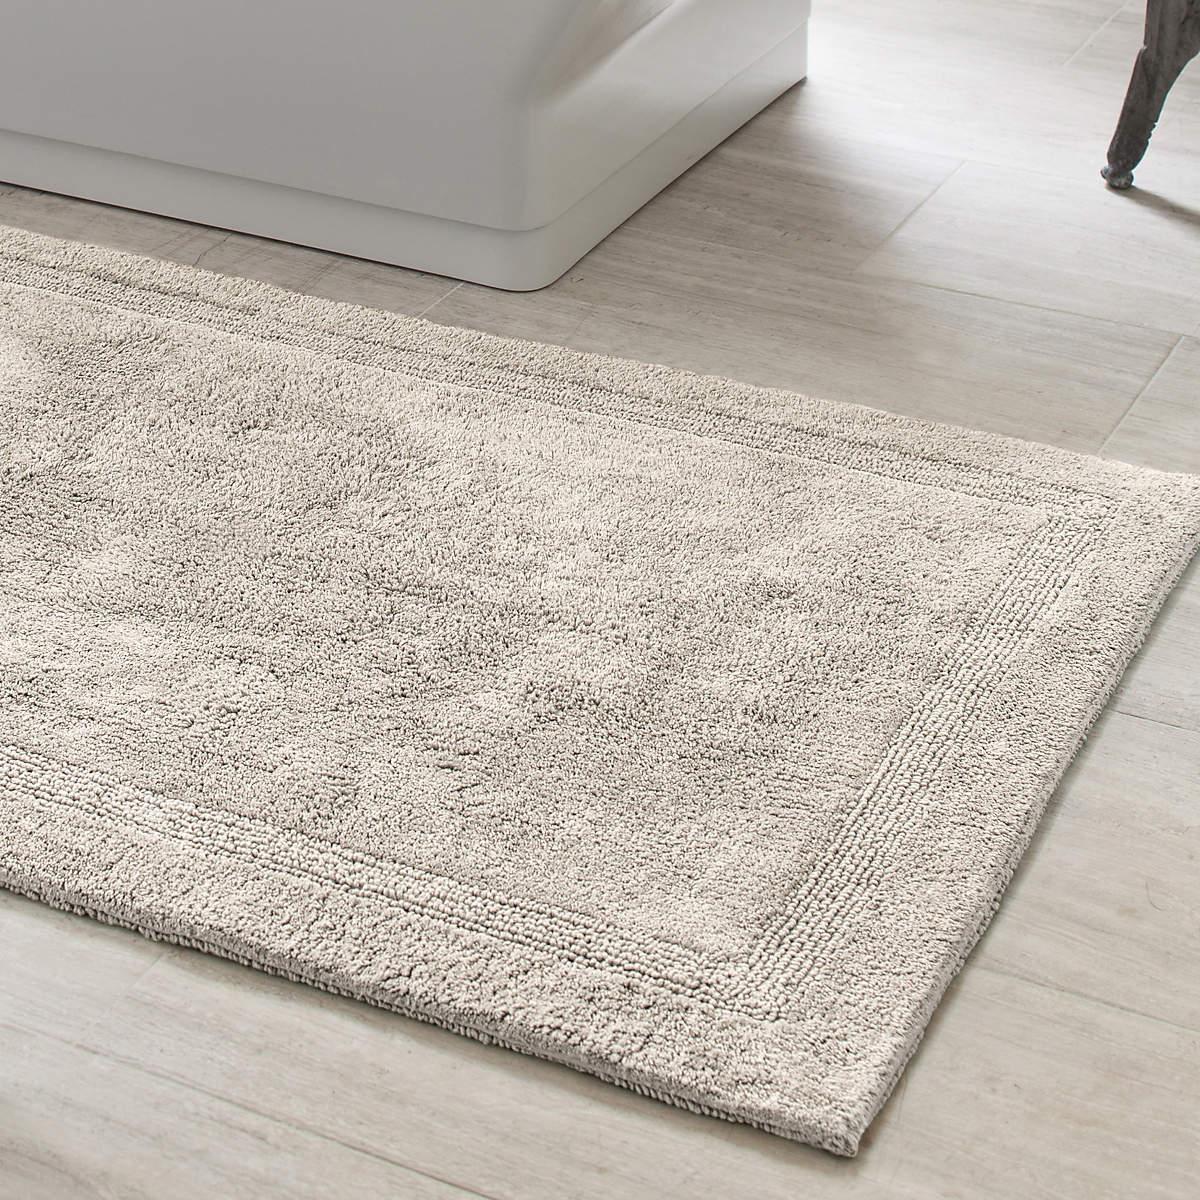 bathroom rug signature dove grey bath rug | pine cone hill CJLVDOO